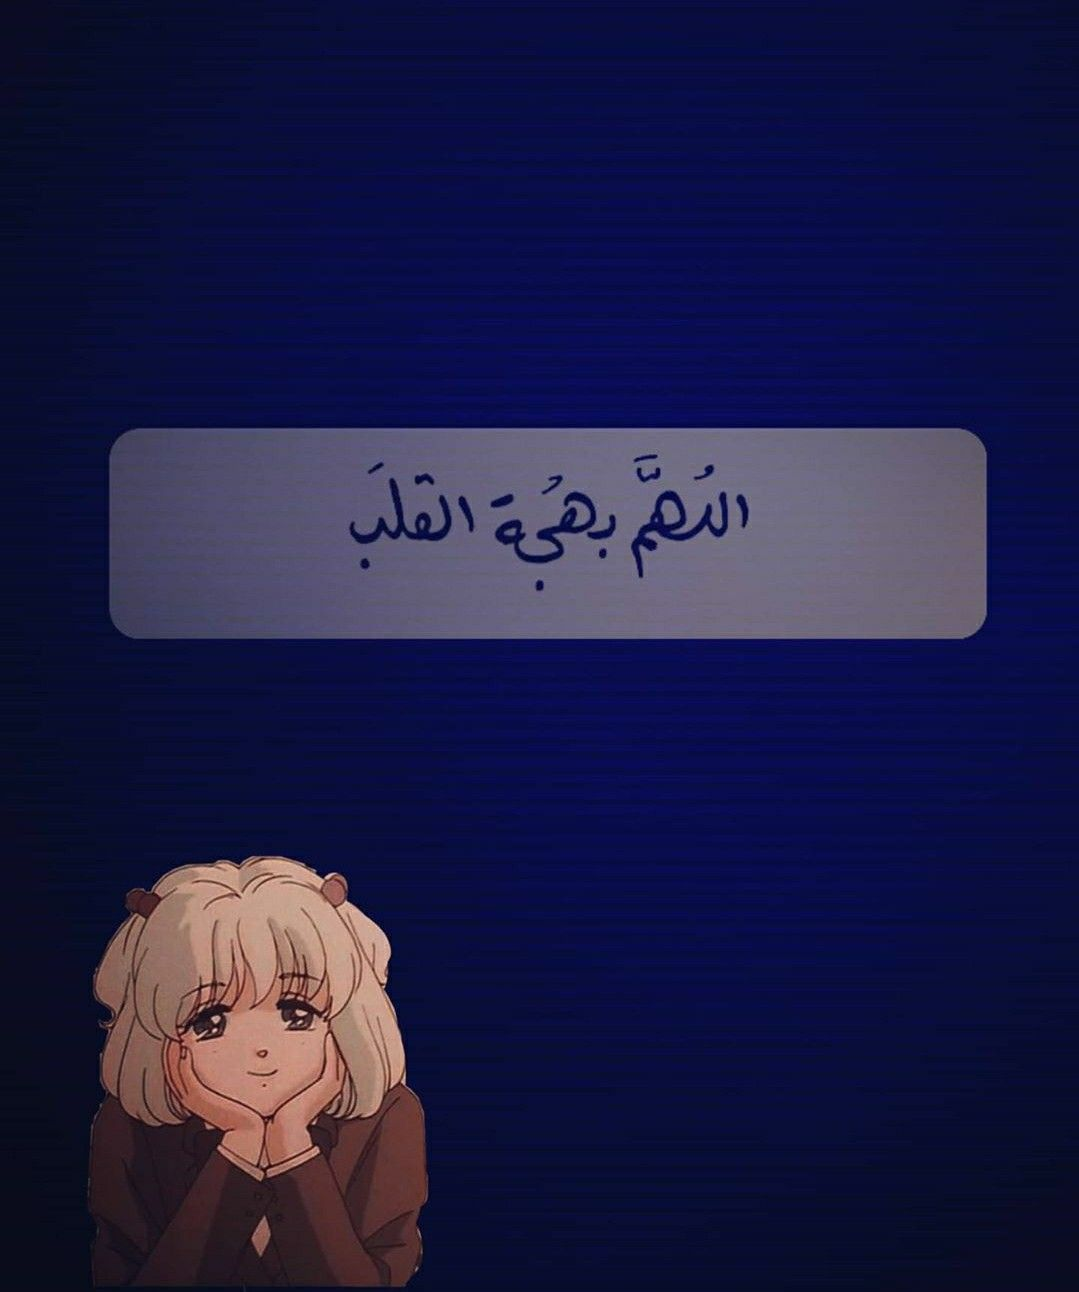 Pin By Dayiie On اقتباسات Instagram Blog Anime Words Quotes